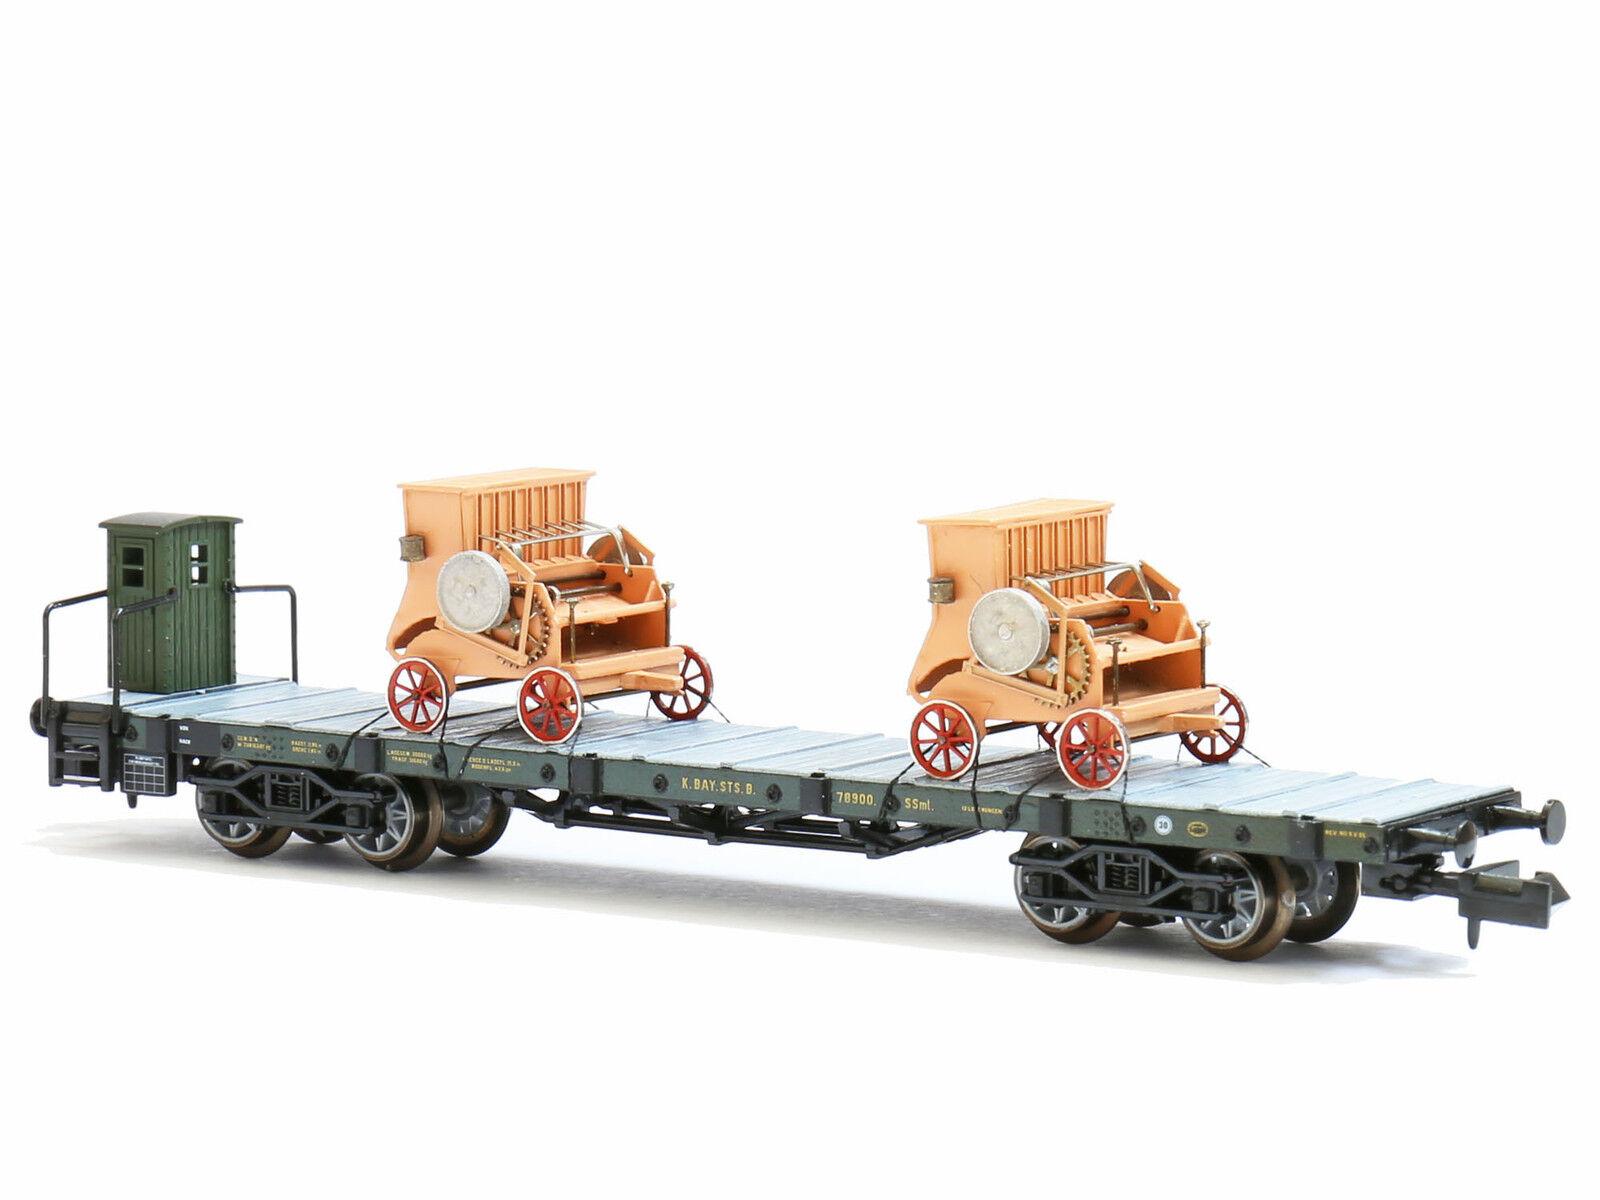 Marks 440600 - 2 Straw presses on Bavarian Freight Wagon Flat Wagon Ep. I-NEW